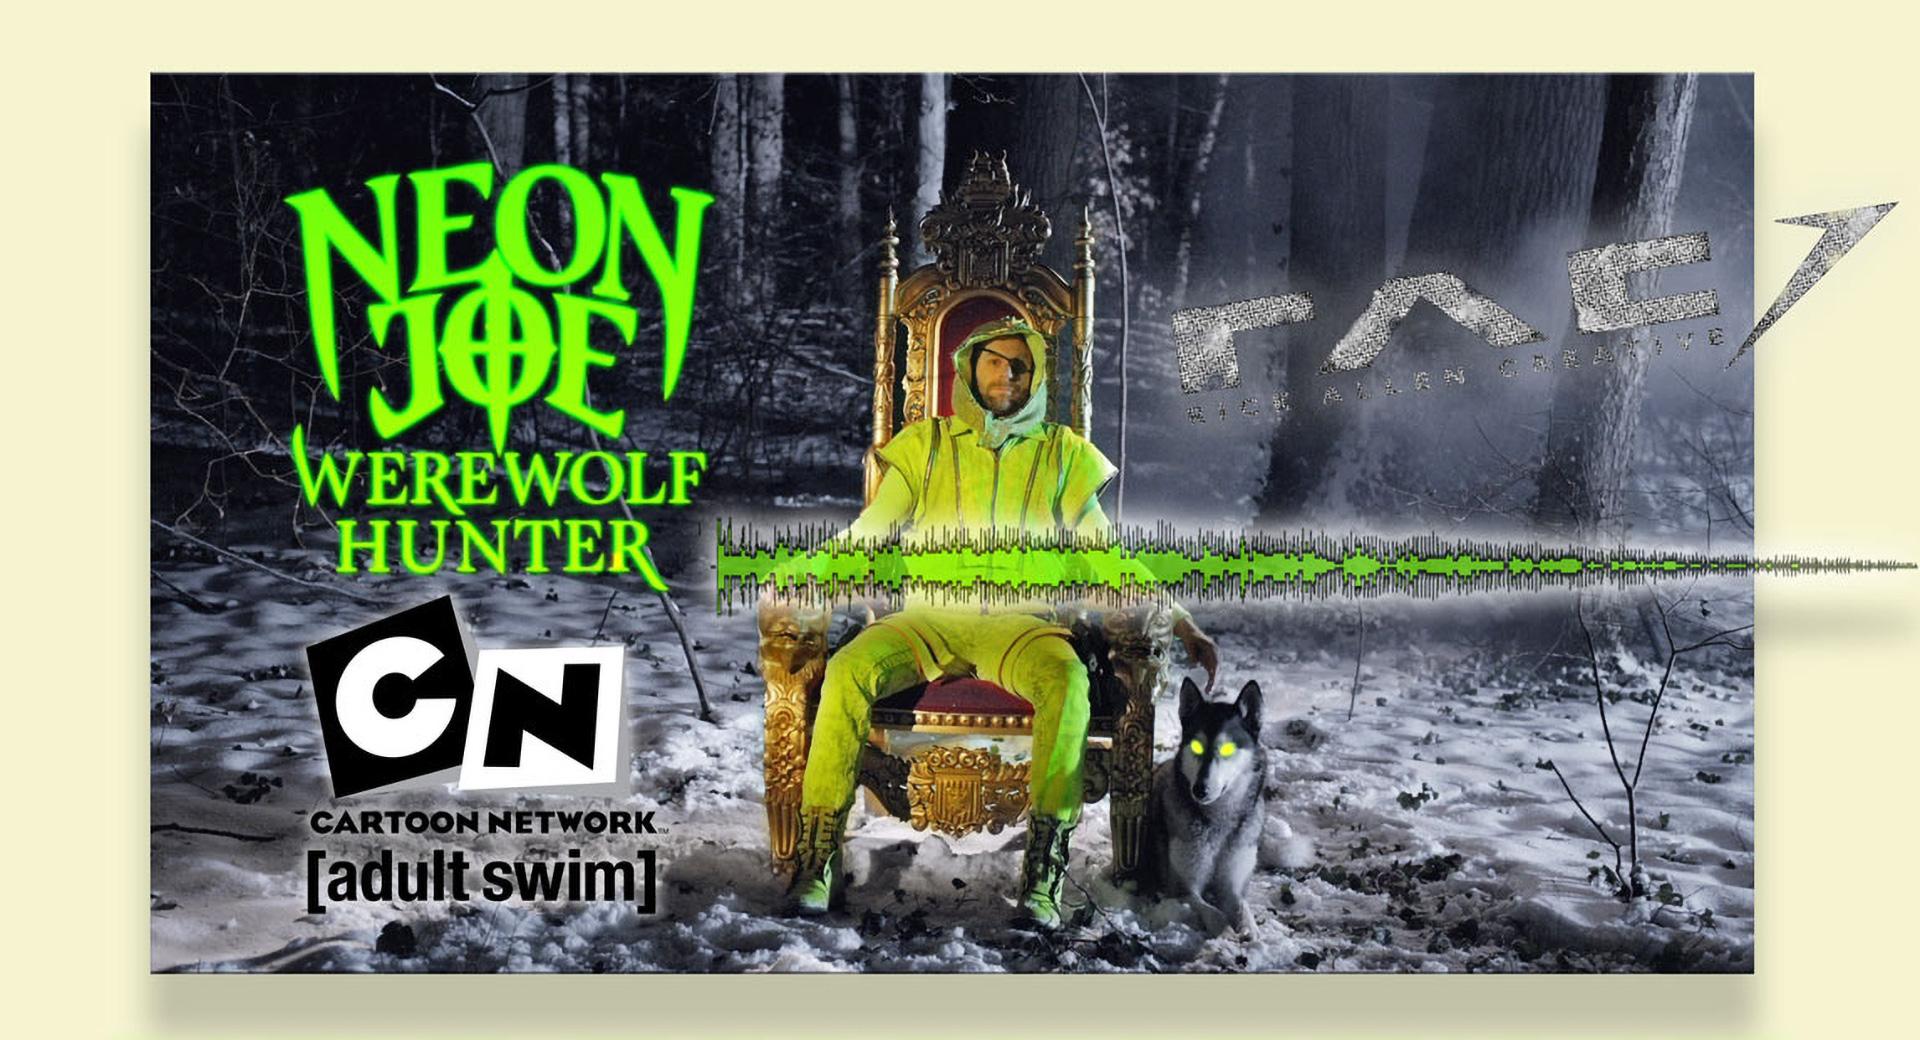 CREDIT-Neon-Joe-Ad-SQRv2.jpg